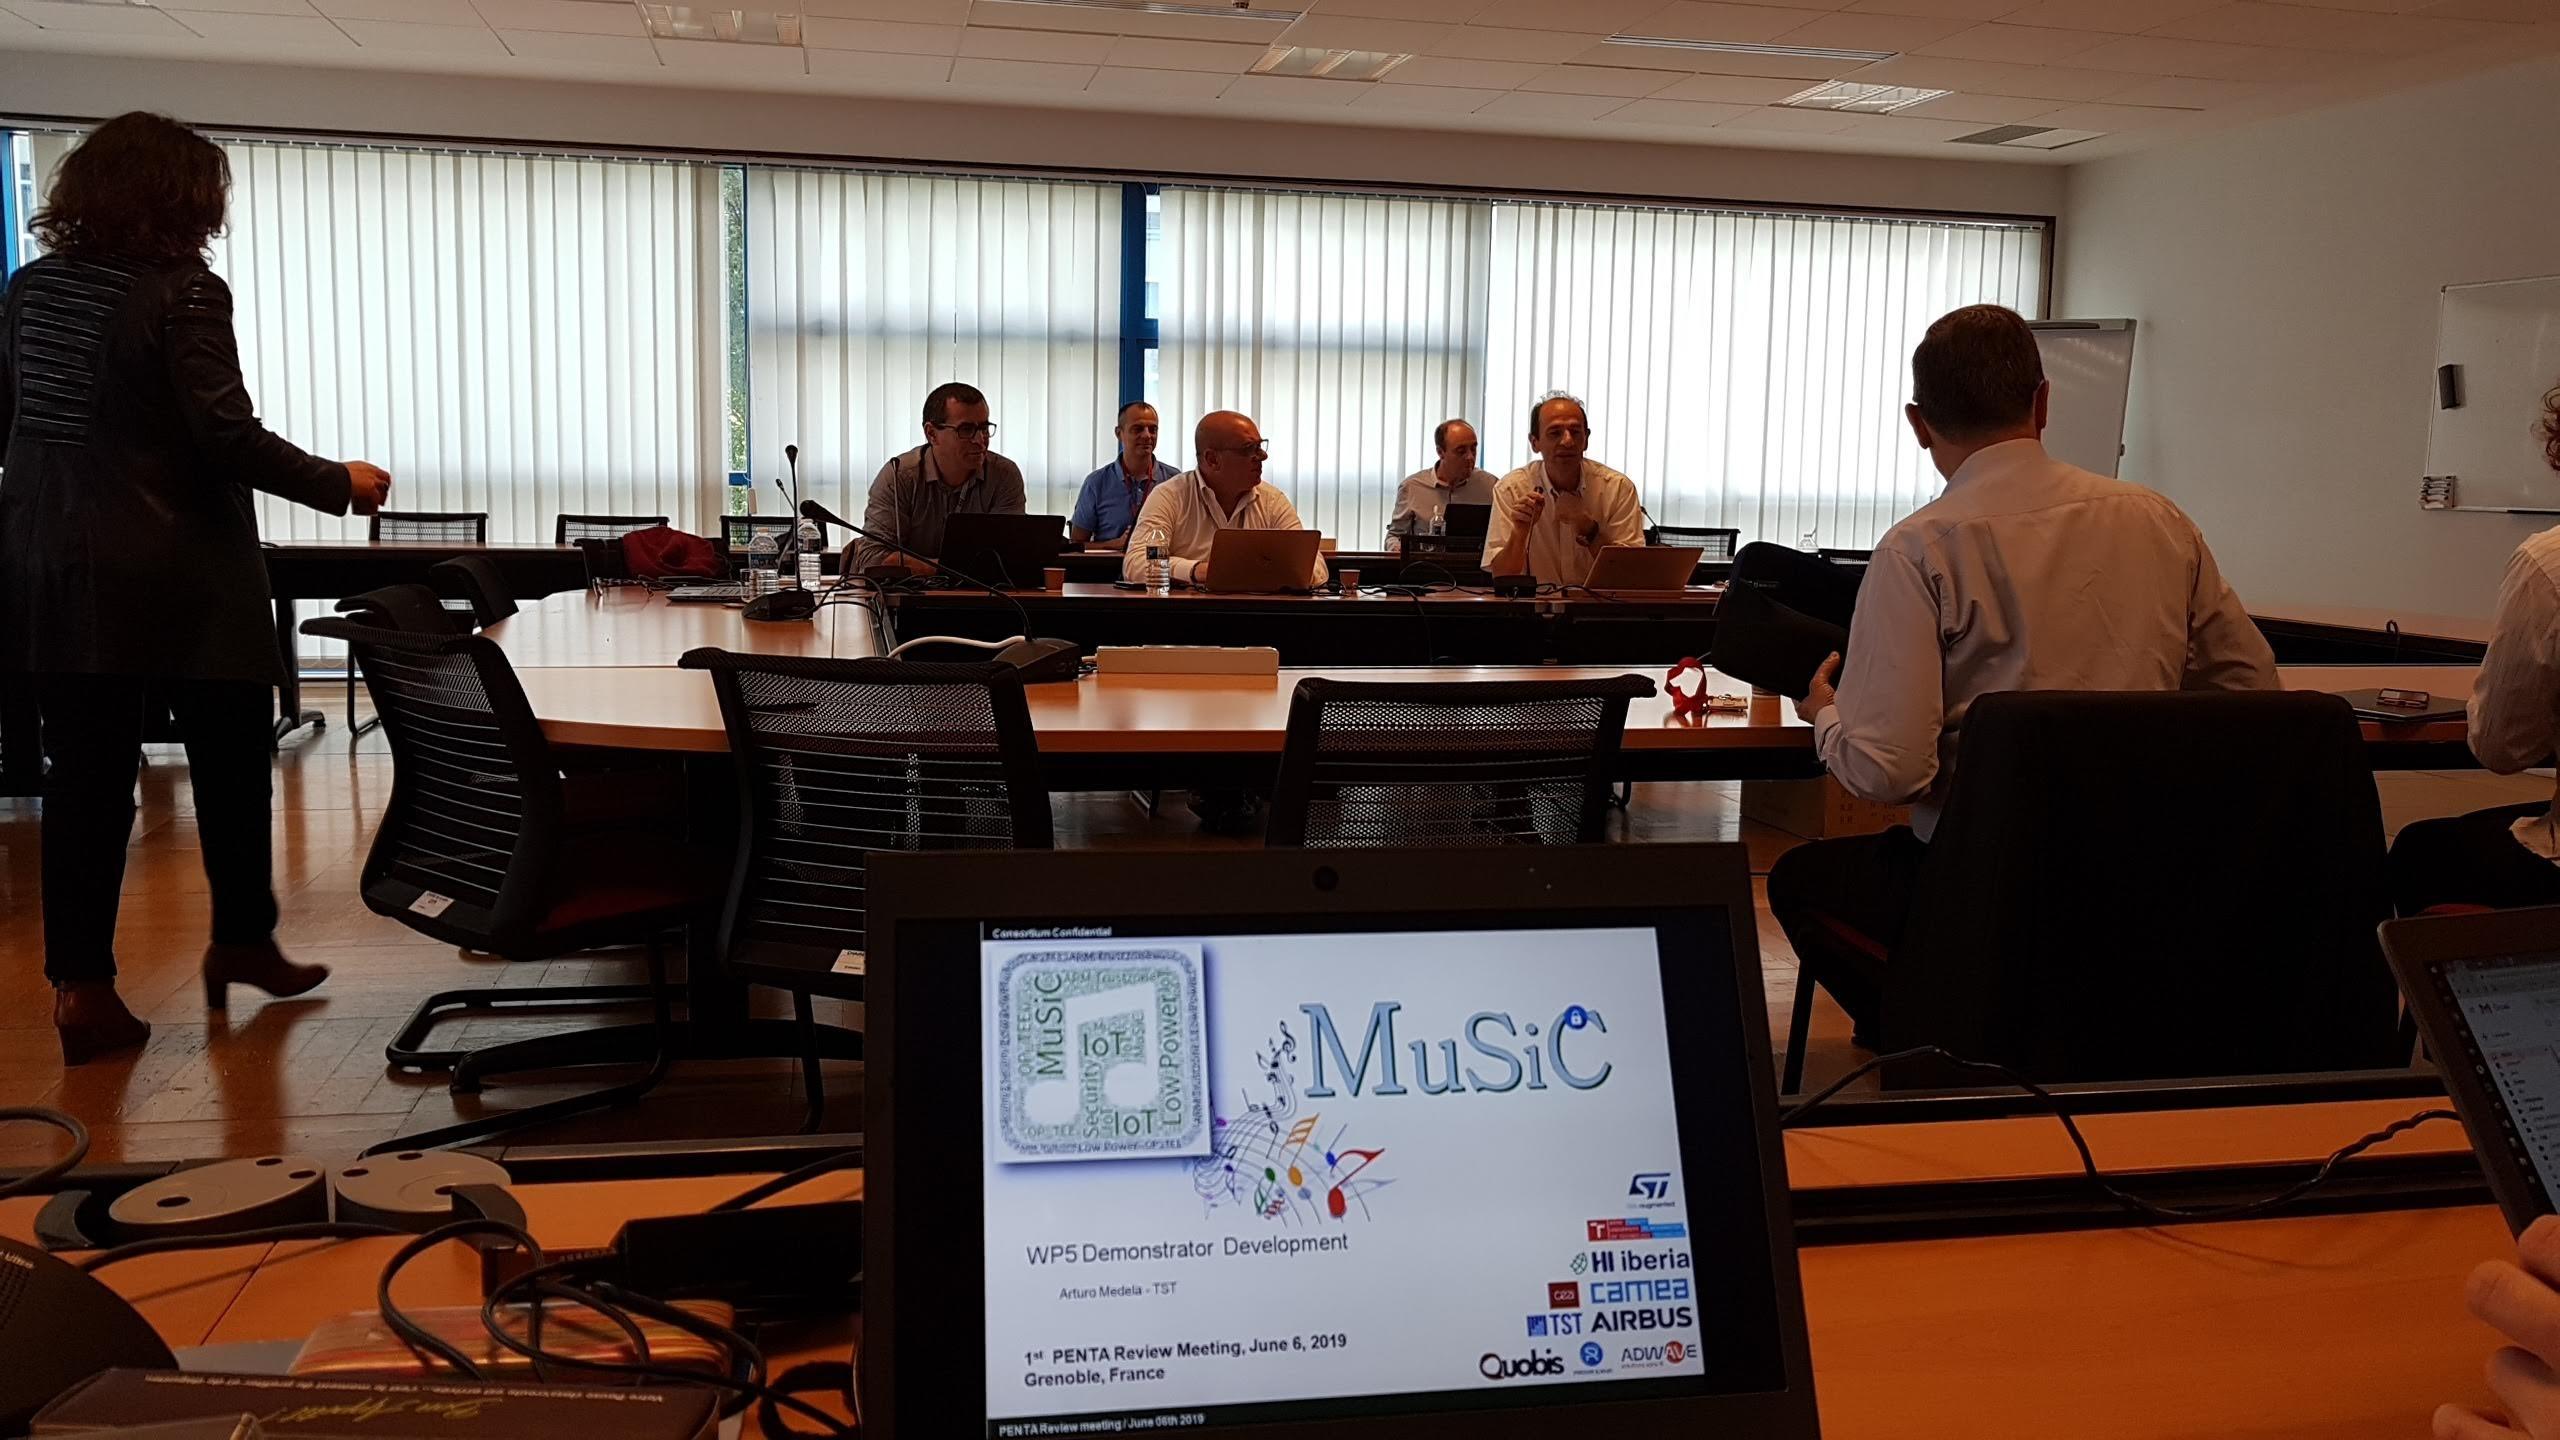 Proyecto MuSiC